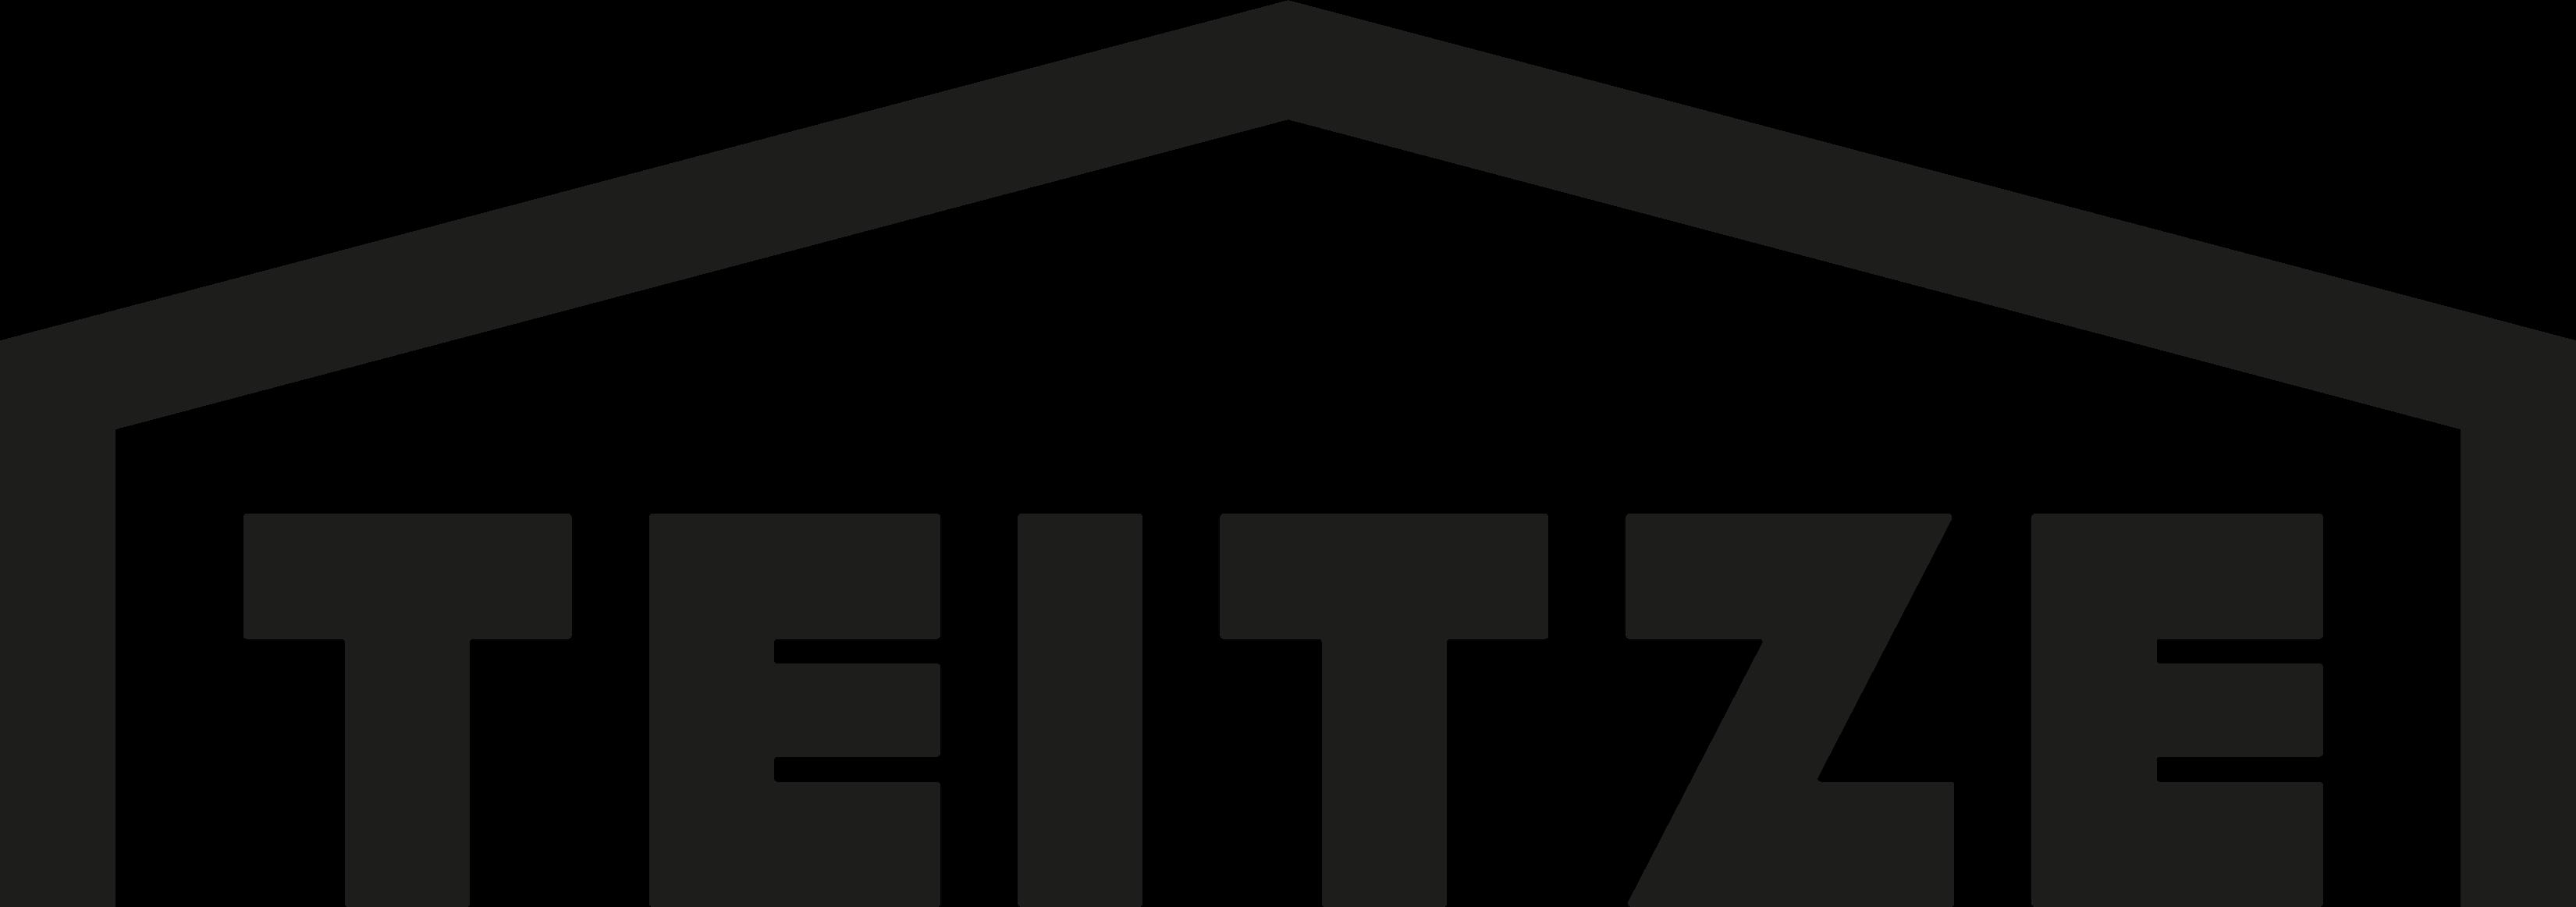 Teitze Oy